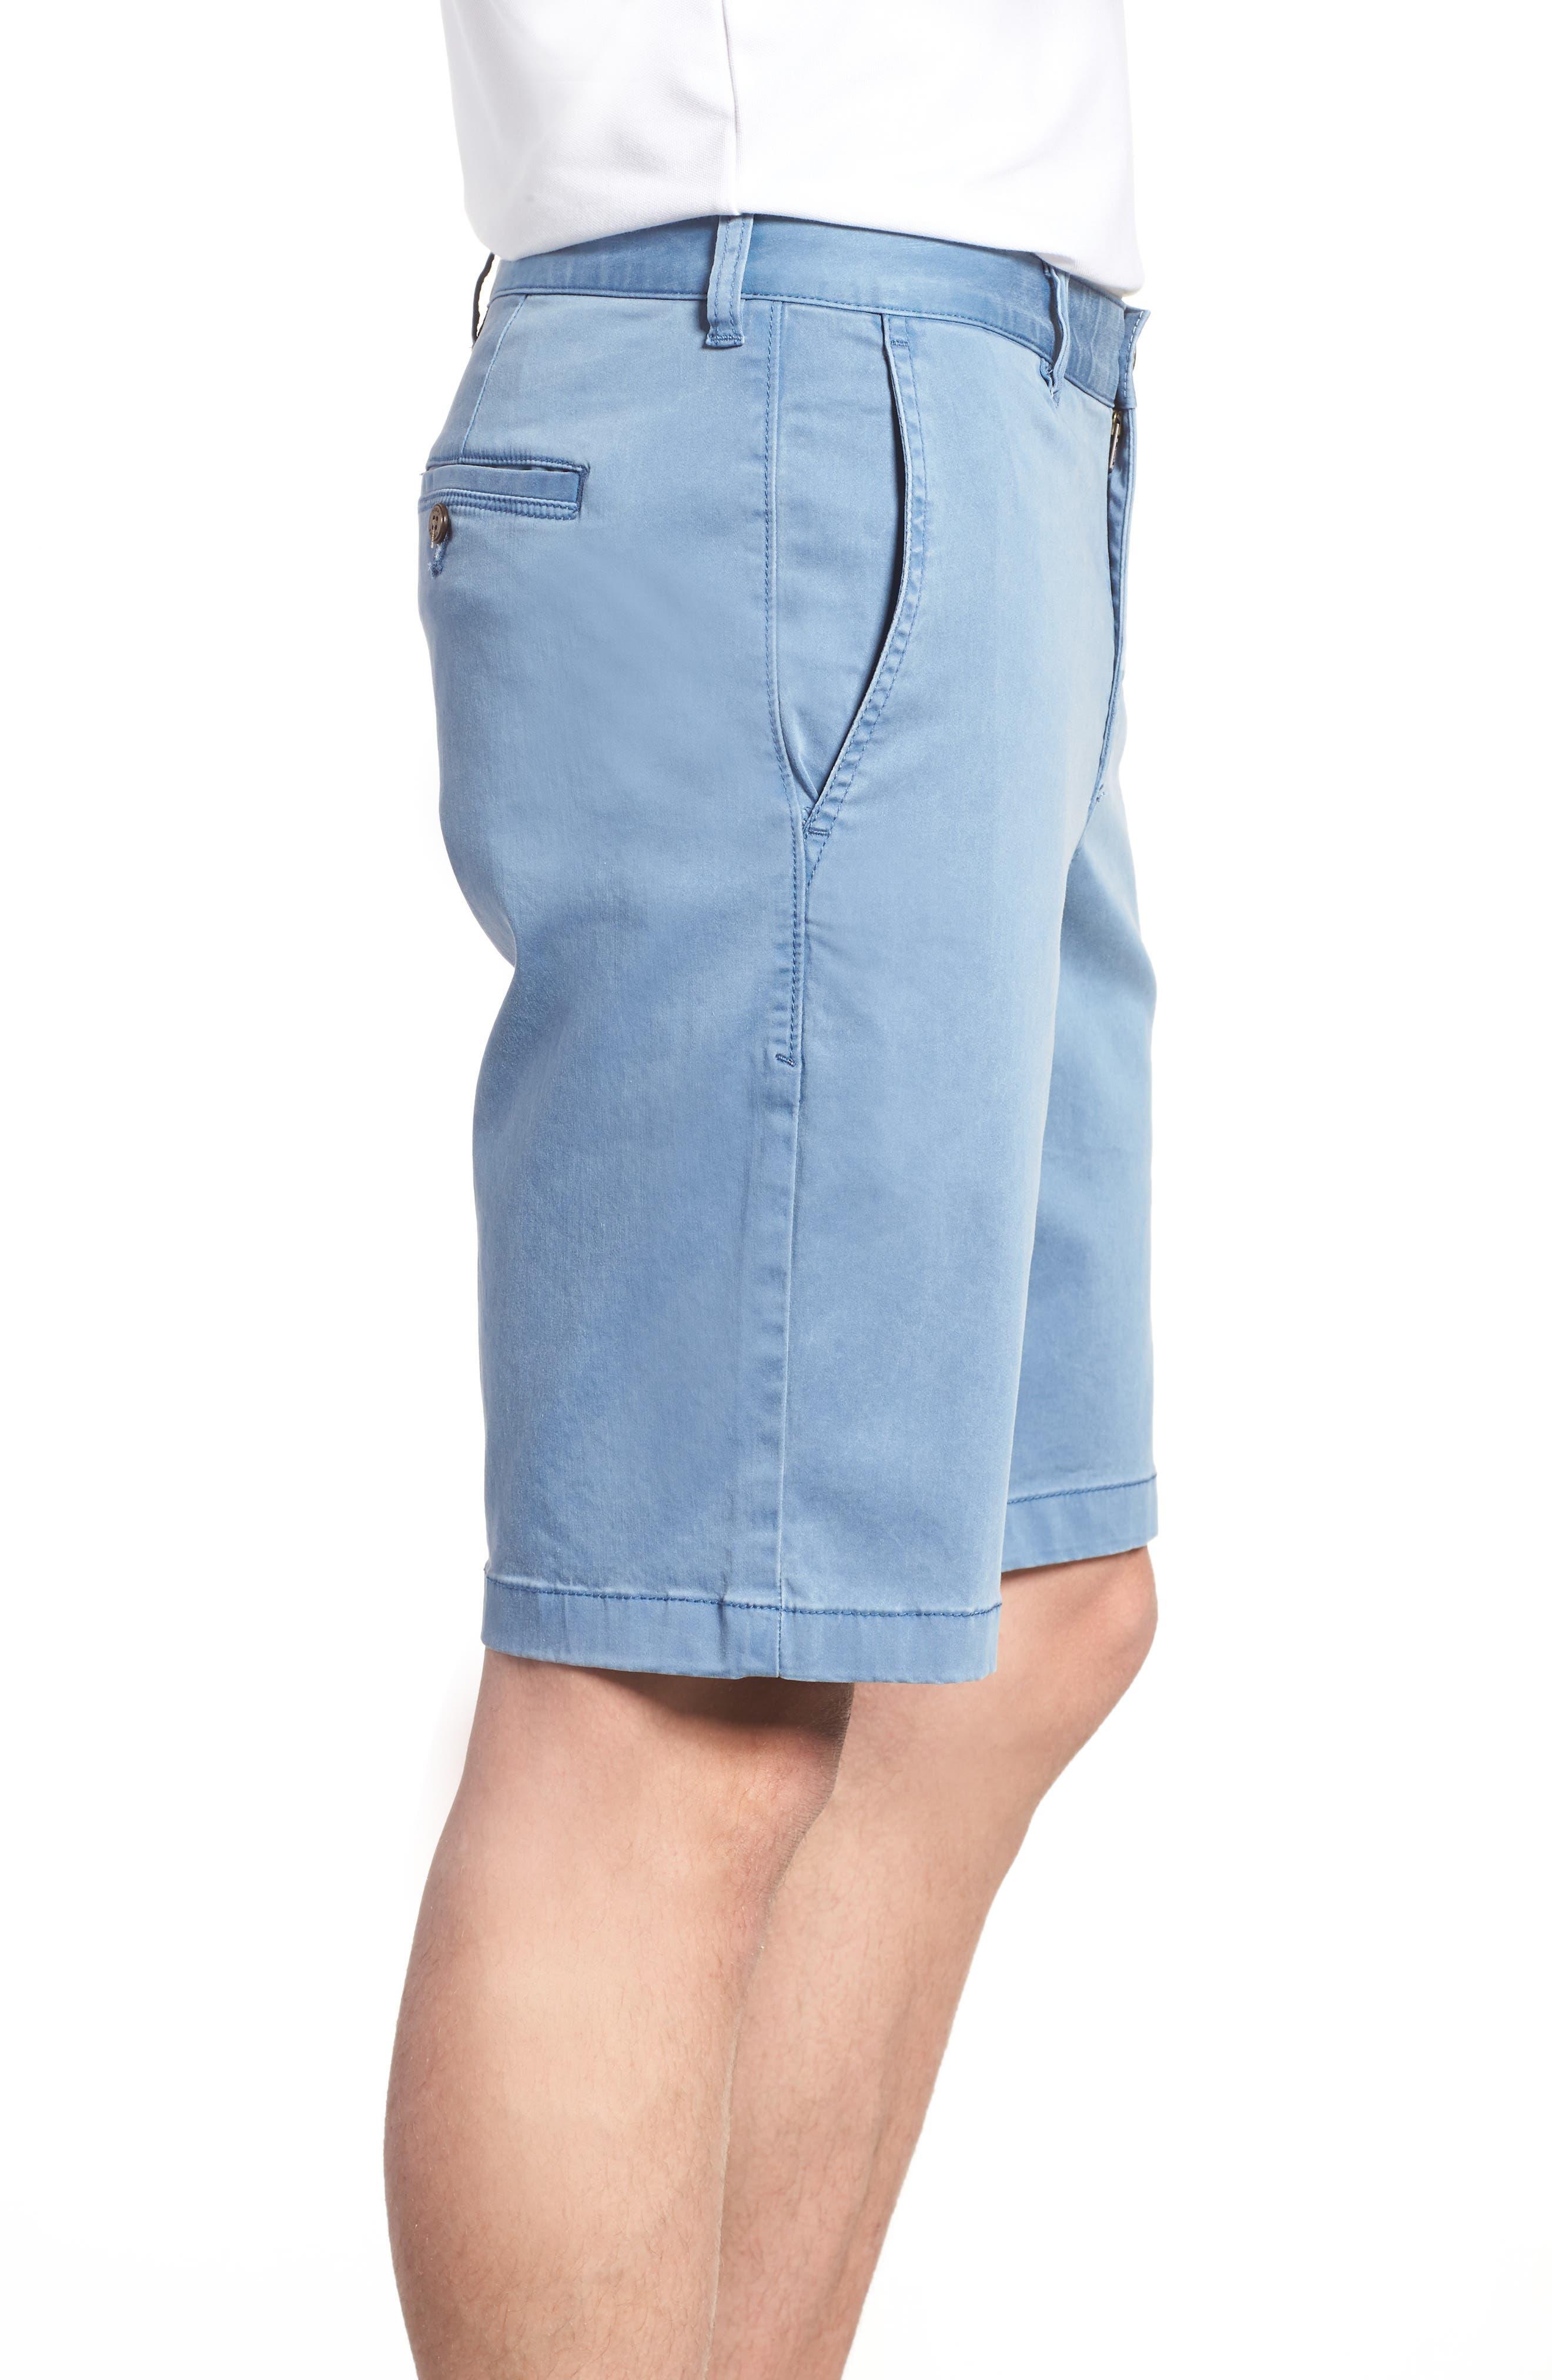 Boracay Chino Shorts,                             Alternate thumbnail 21, color,